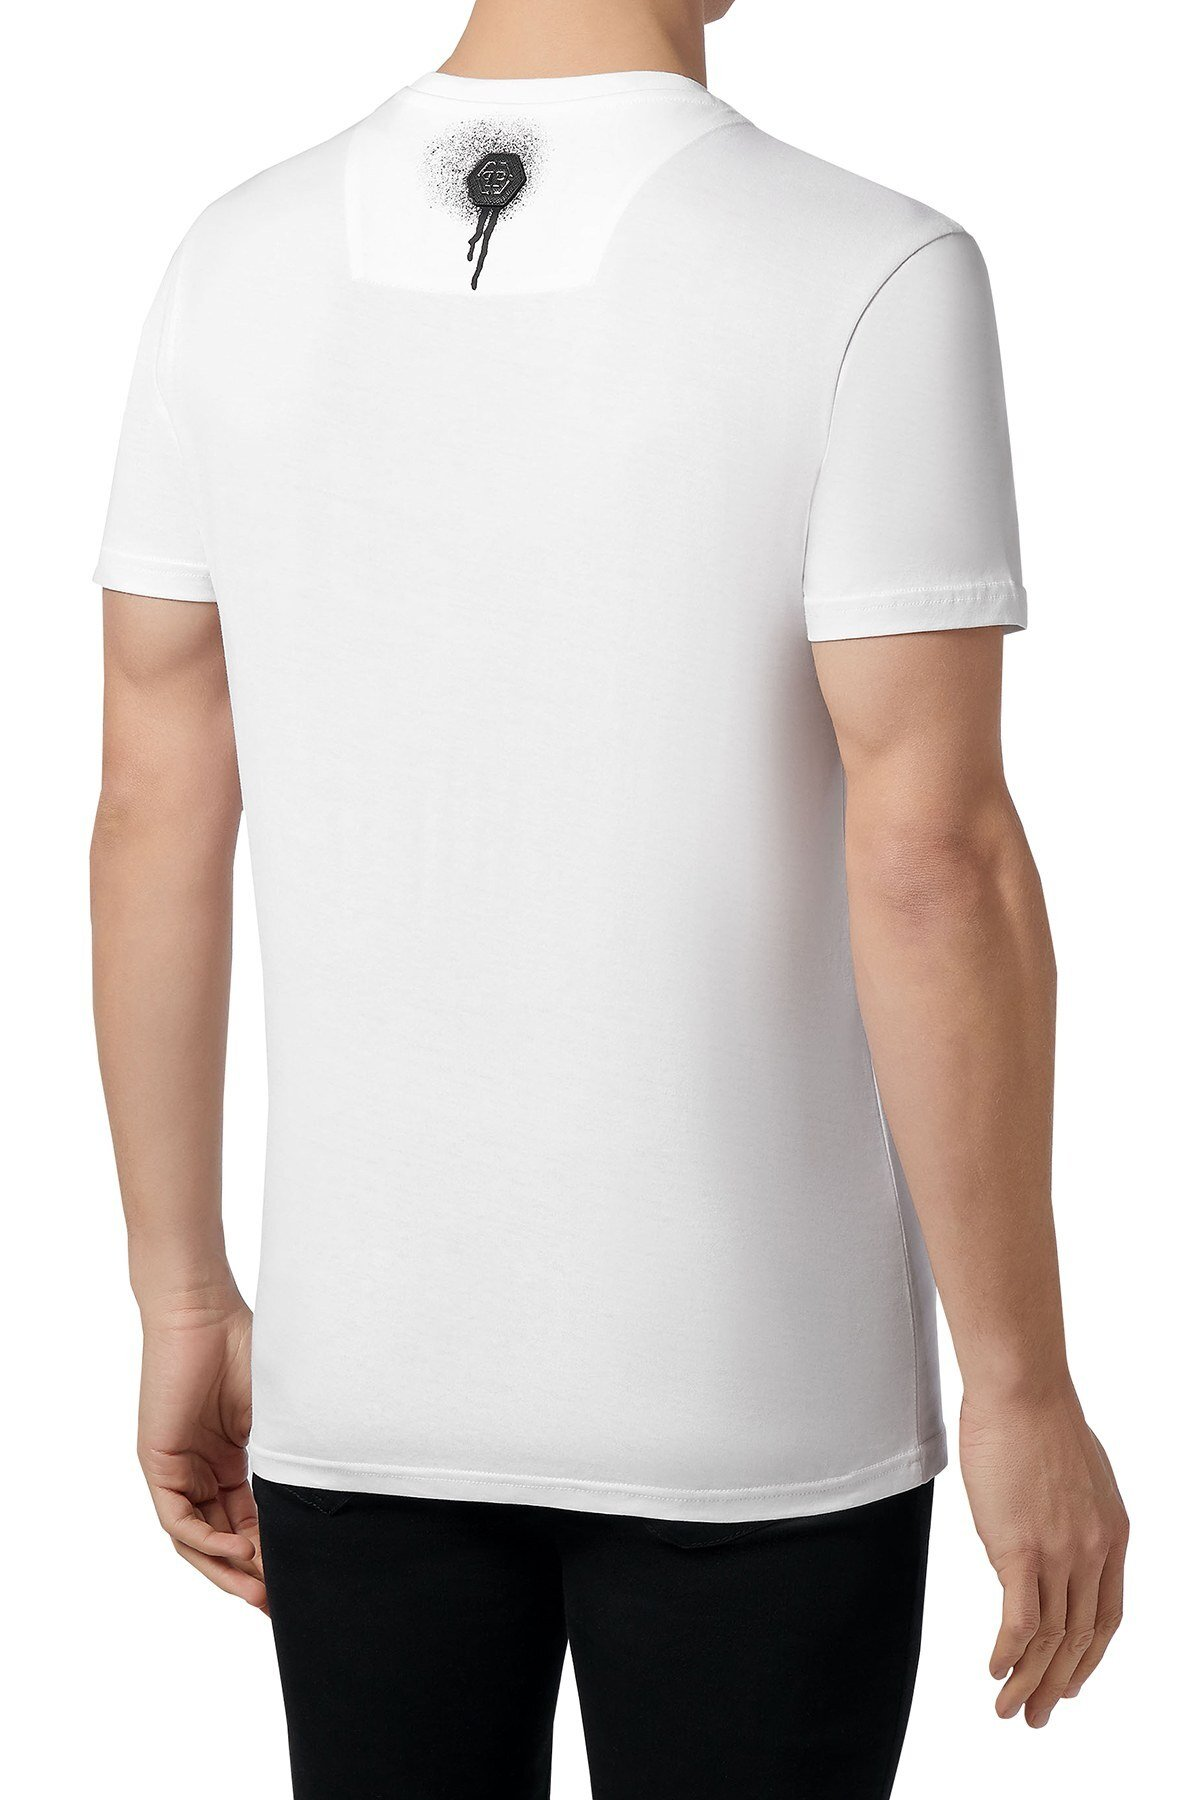 Philipp Plein Baskılı % 100 Pamuklu Erkek T Shirt F20C MTK4593 PJY002N 01 BEYAZ